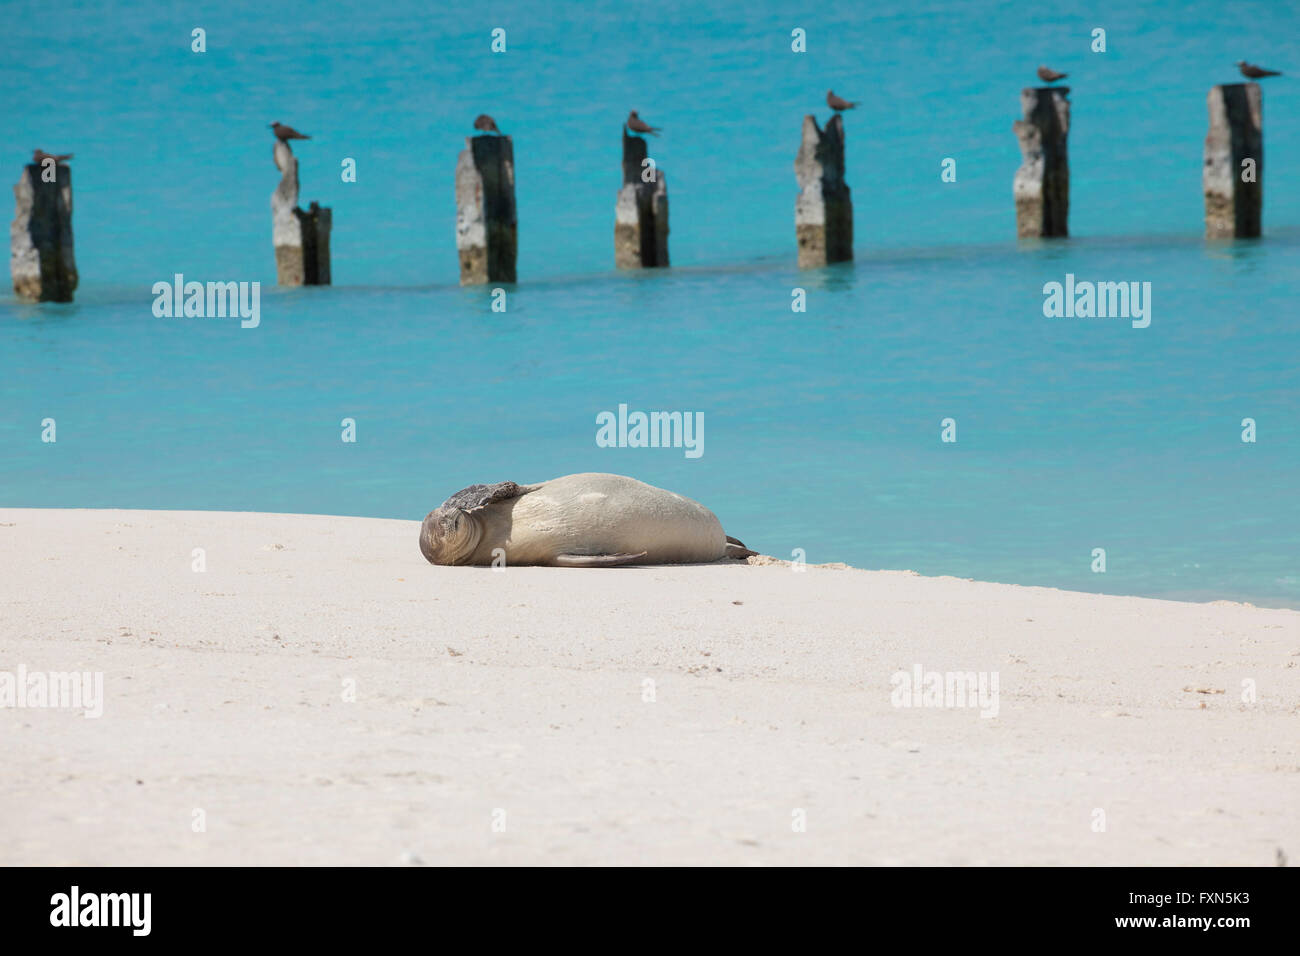 Hawaiian monk seal, Neomonachus schauinslandi, Critically Endangered Species, endemic to Hawaii, Sand Island, Midway - Stock Image